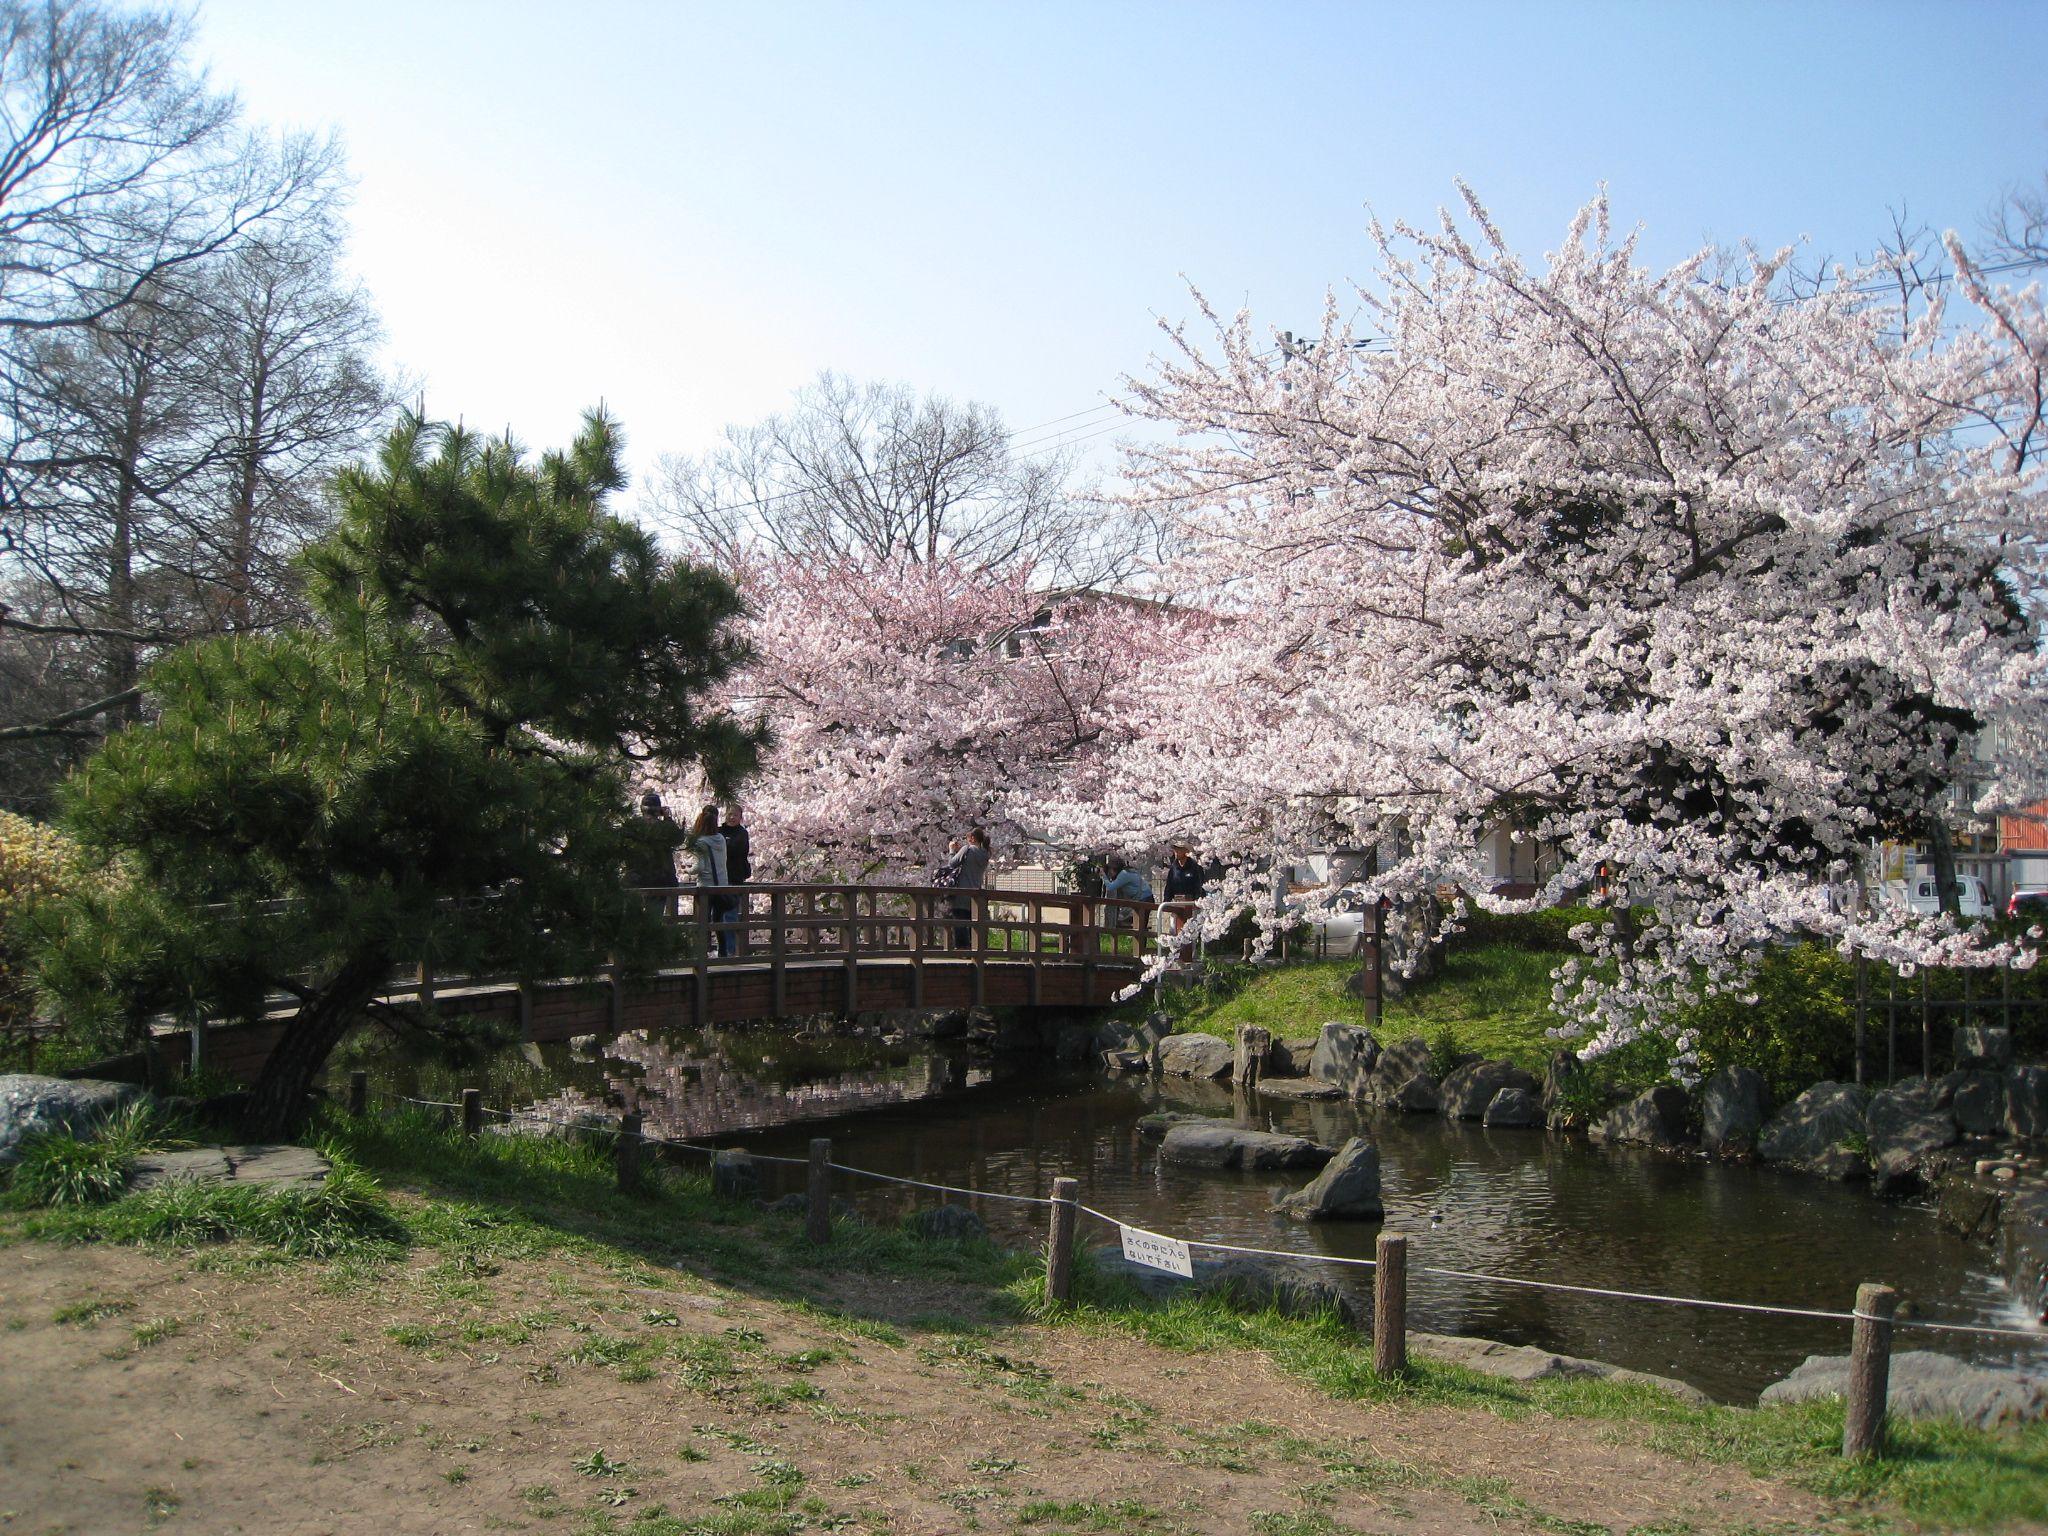 桜(sakura)、Cherry Blossom、My photo